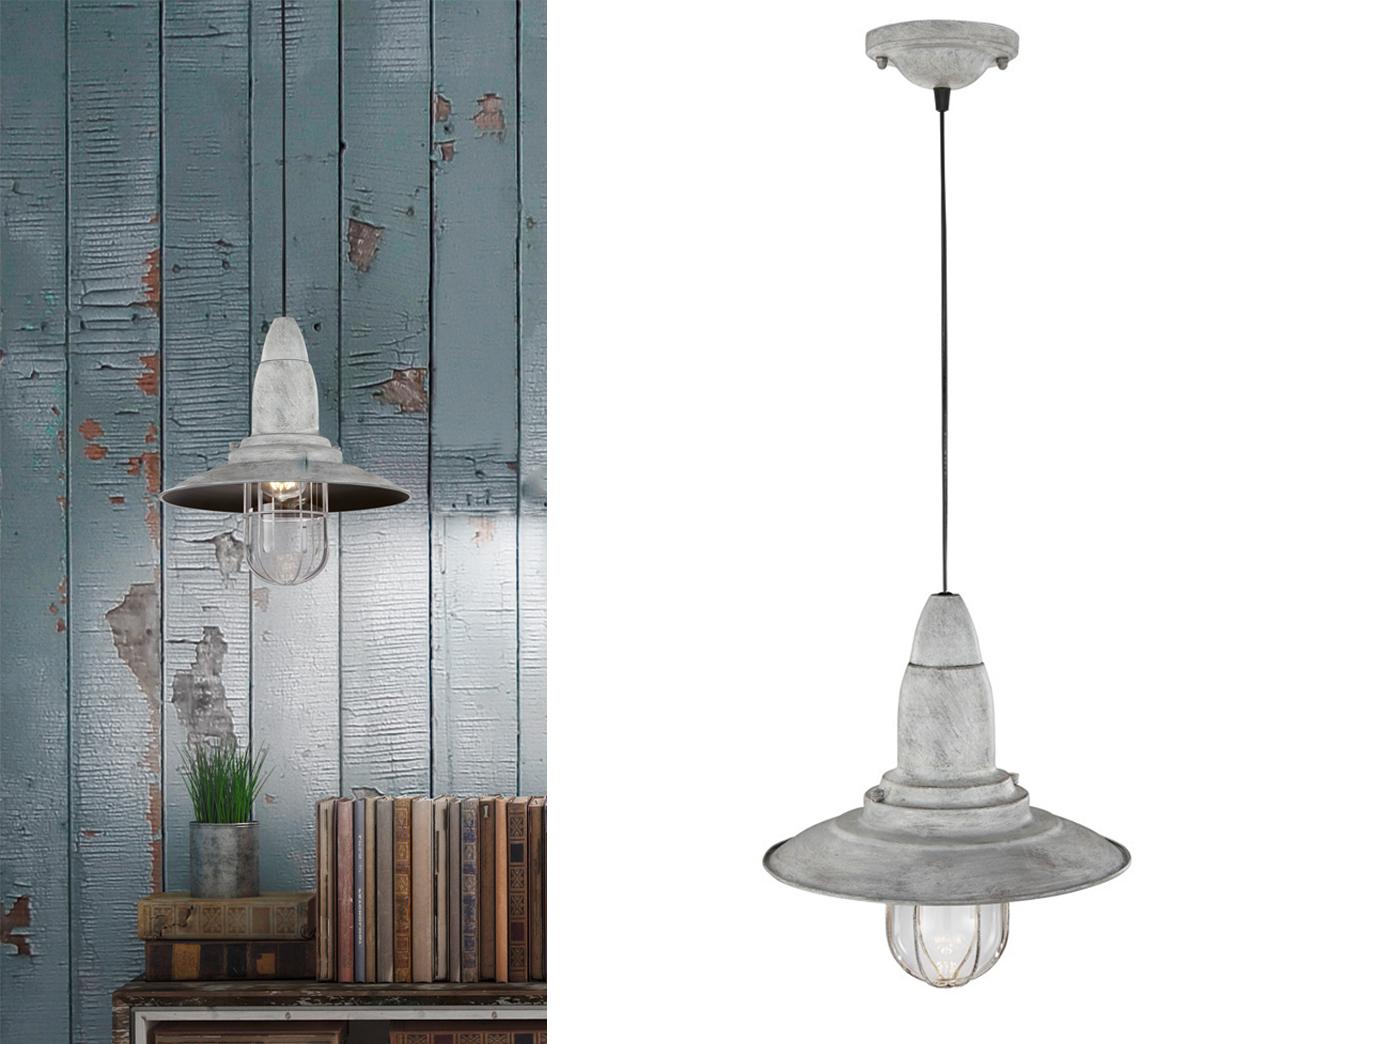 LED Hängelampe Kupfer antik Lampenschirm Glas 32cm Retro Pendelleuchte Vintage